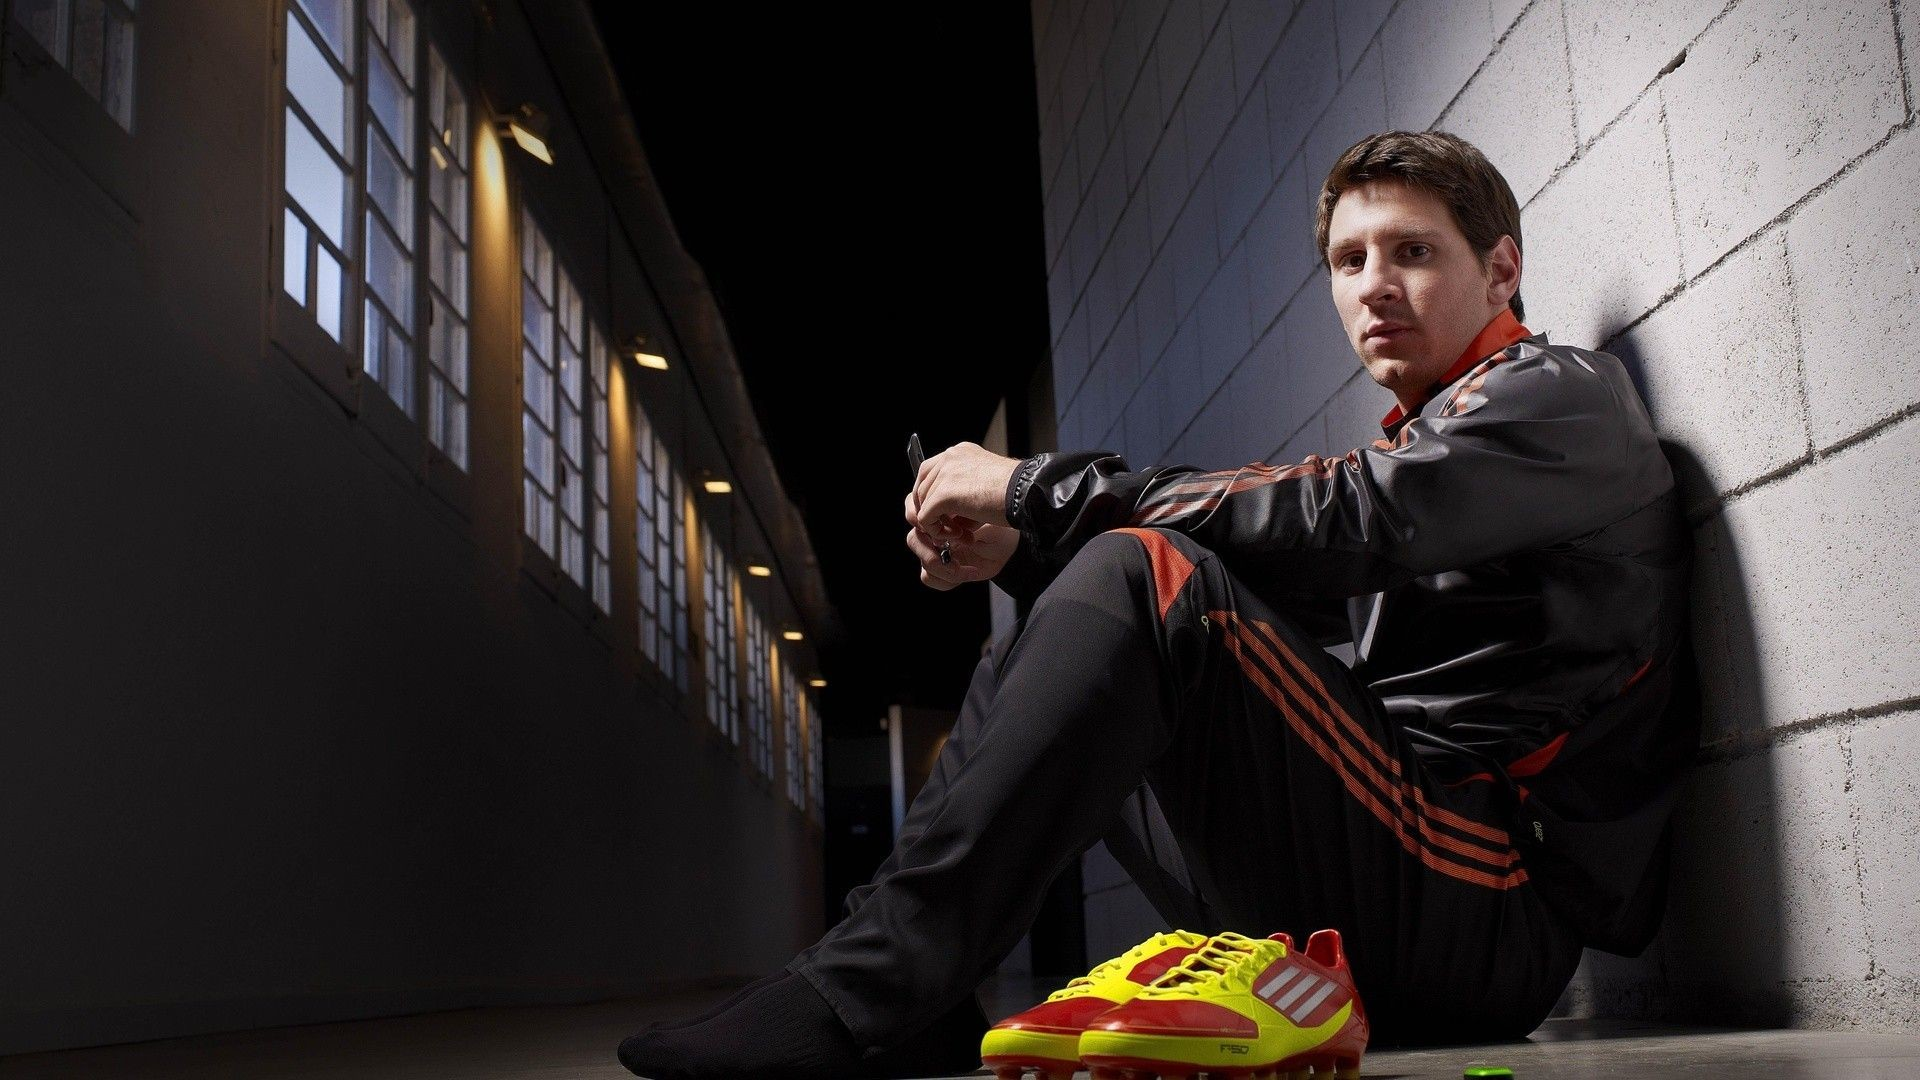 Lionel Messi Wallpaper Free Download